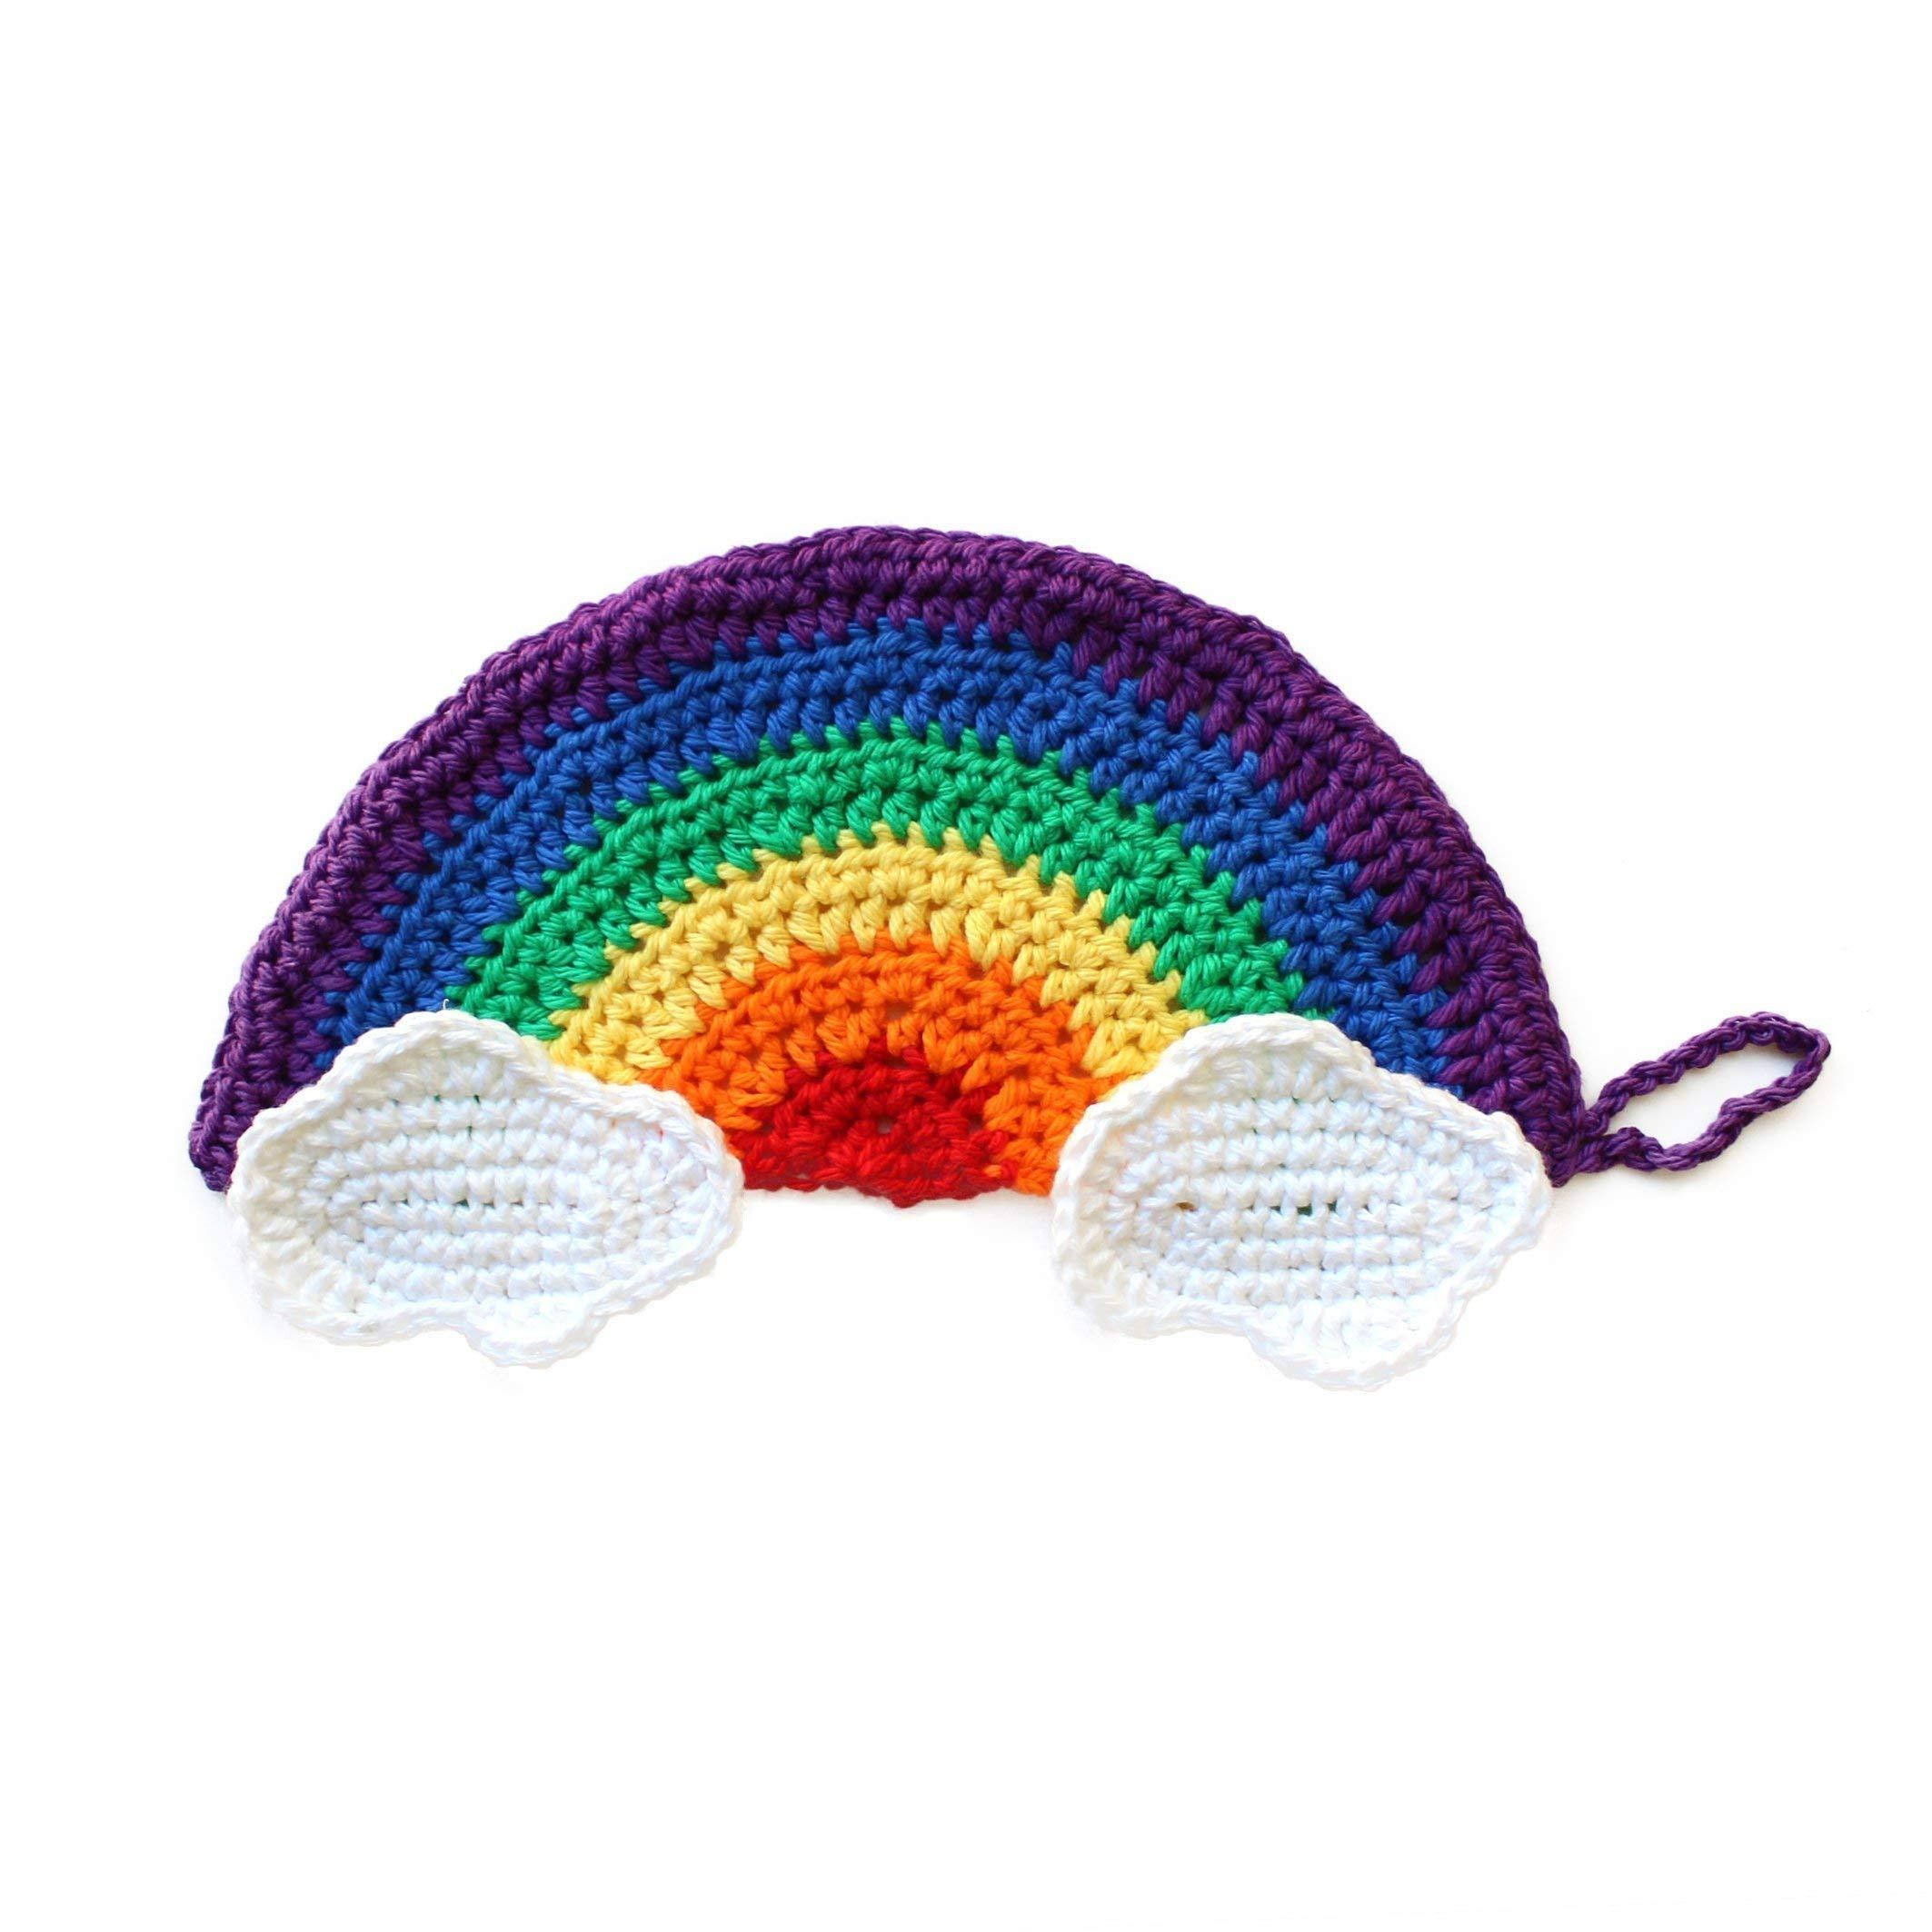 Handmade crochet rainbow & clouds washcloth by Geekirumi! - Cotton scrubbies for kitchen or spa (set of 3)